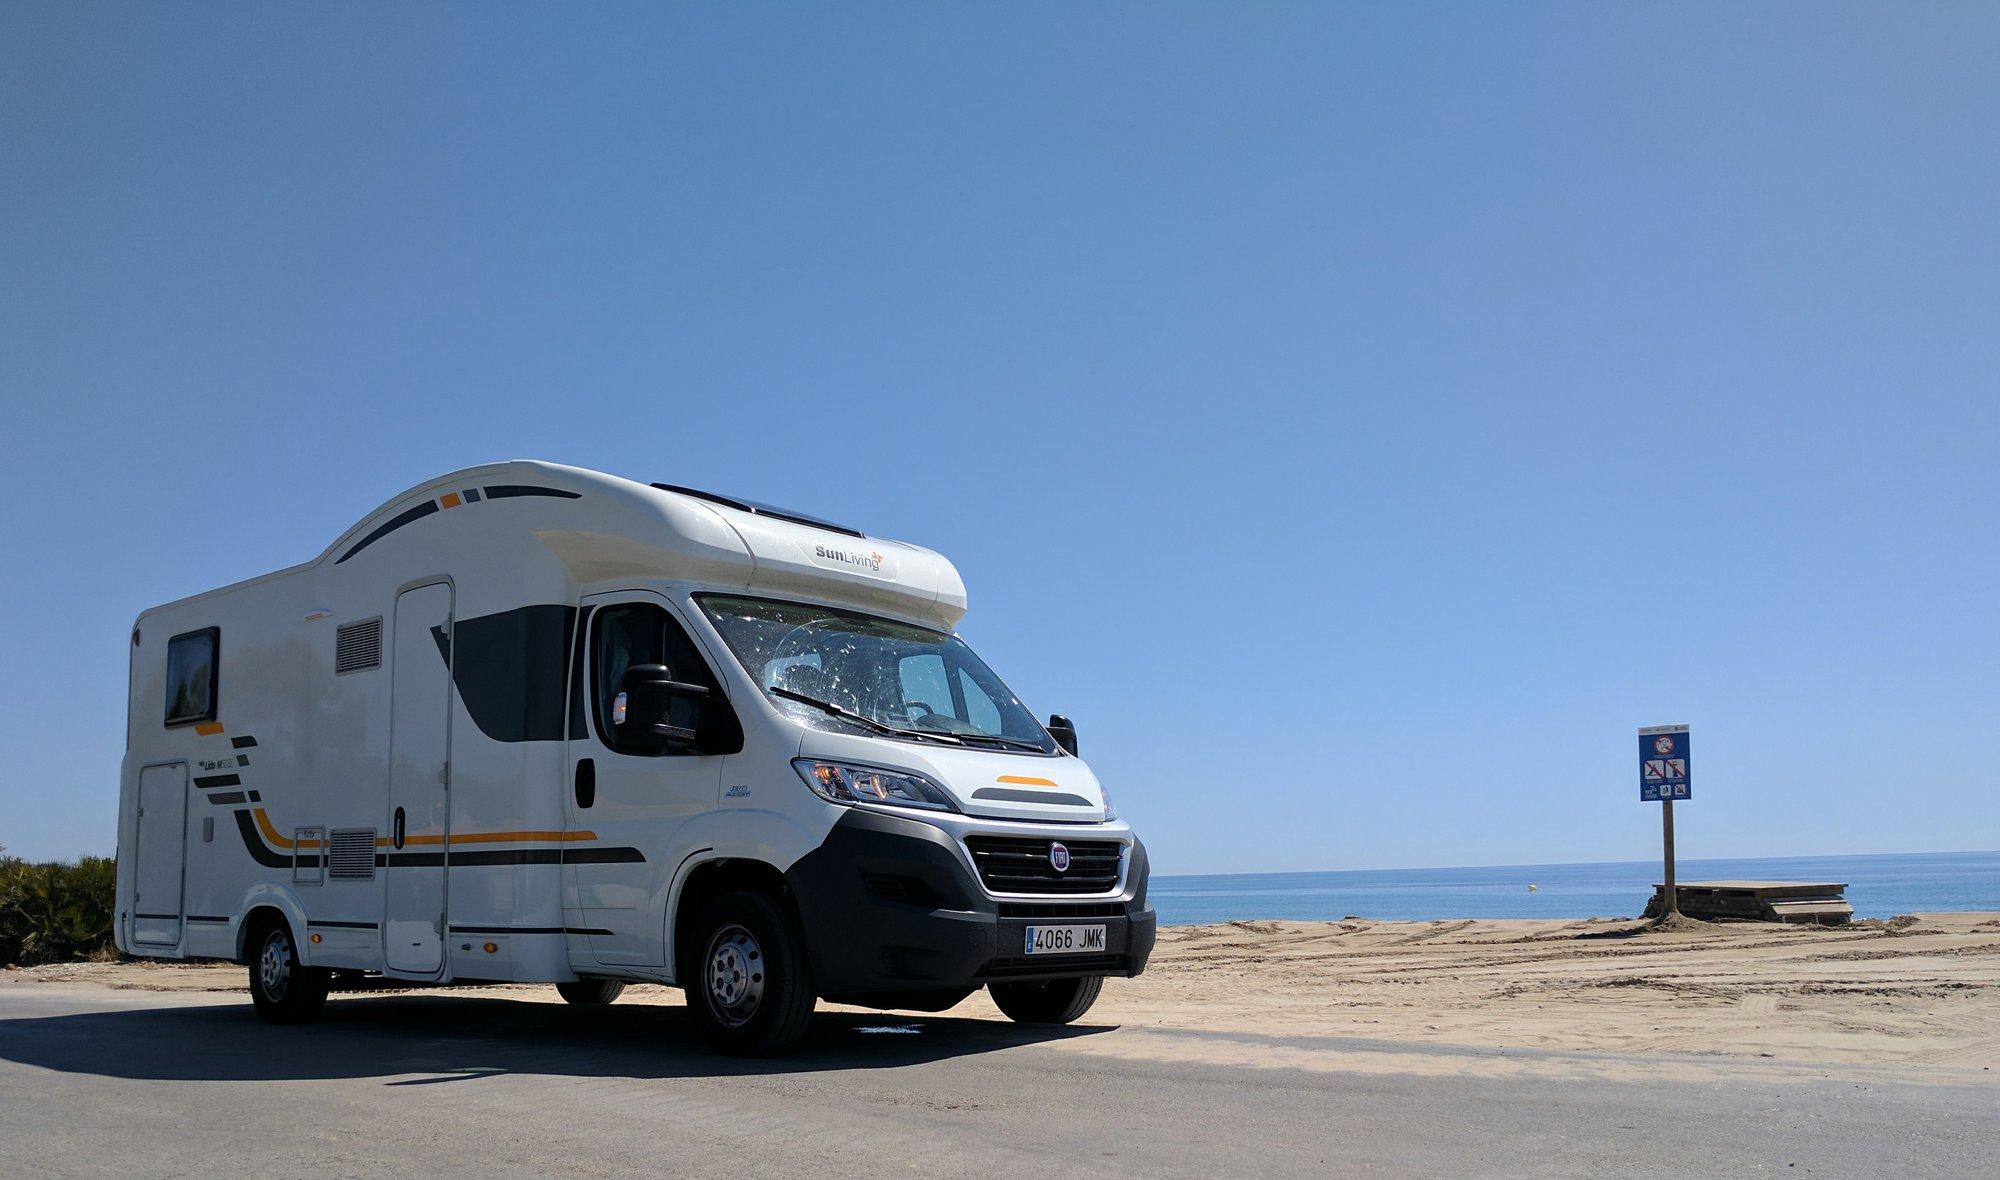 963ea2385c7cda RV-tripping Spain  Coastal campgrounds